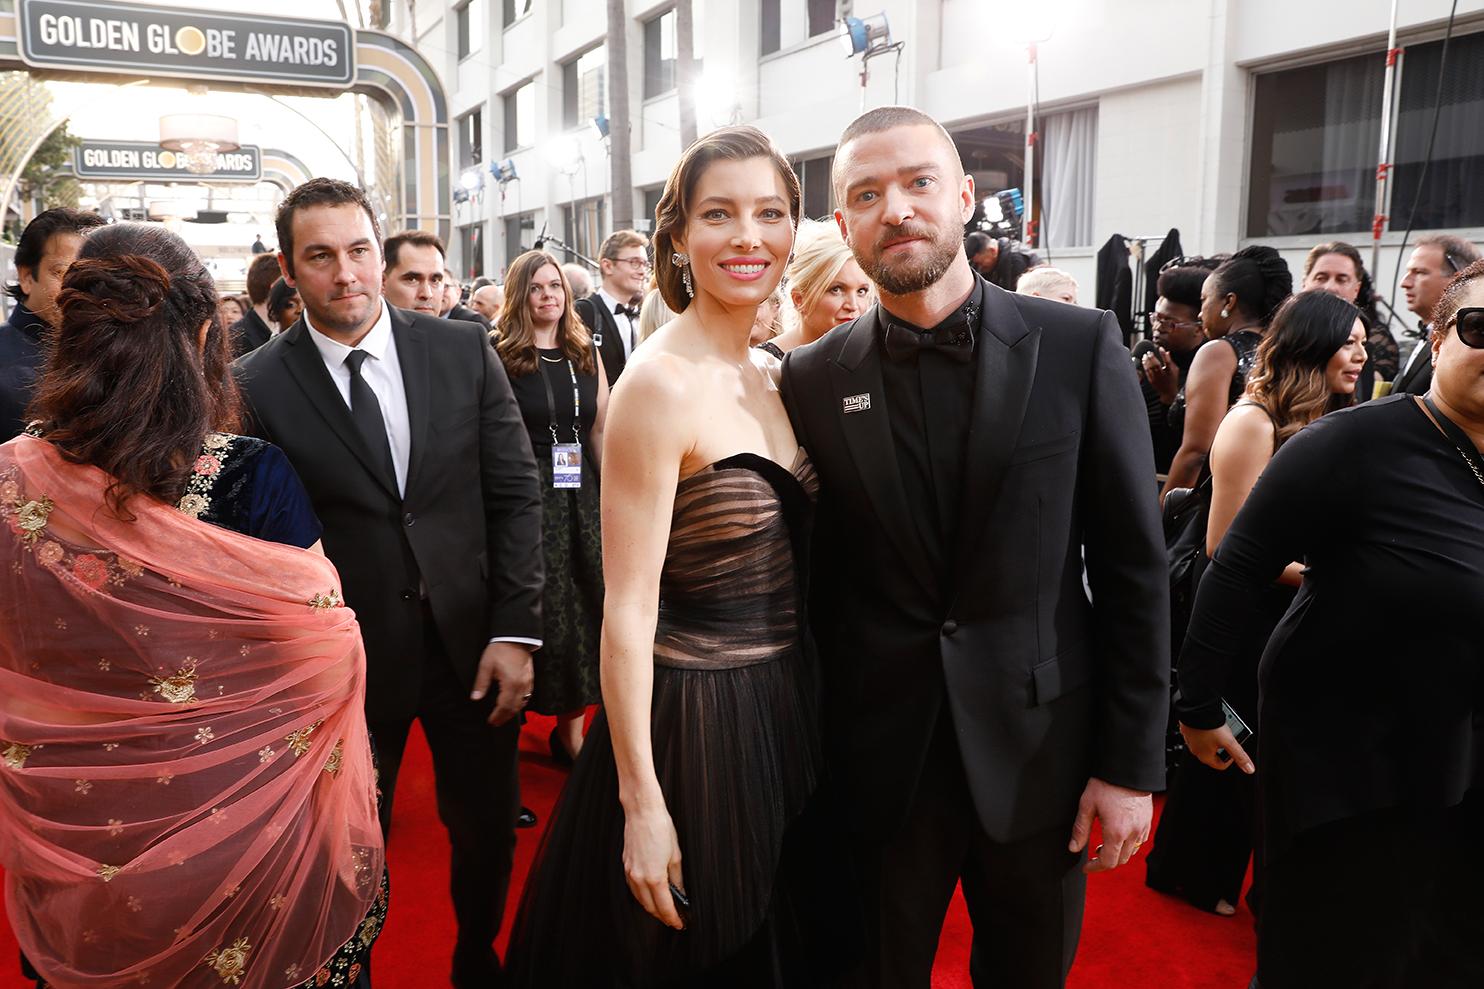 Justin Timberlake and Jessica Biel 2018 Golden Globes